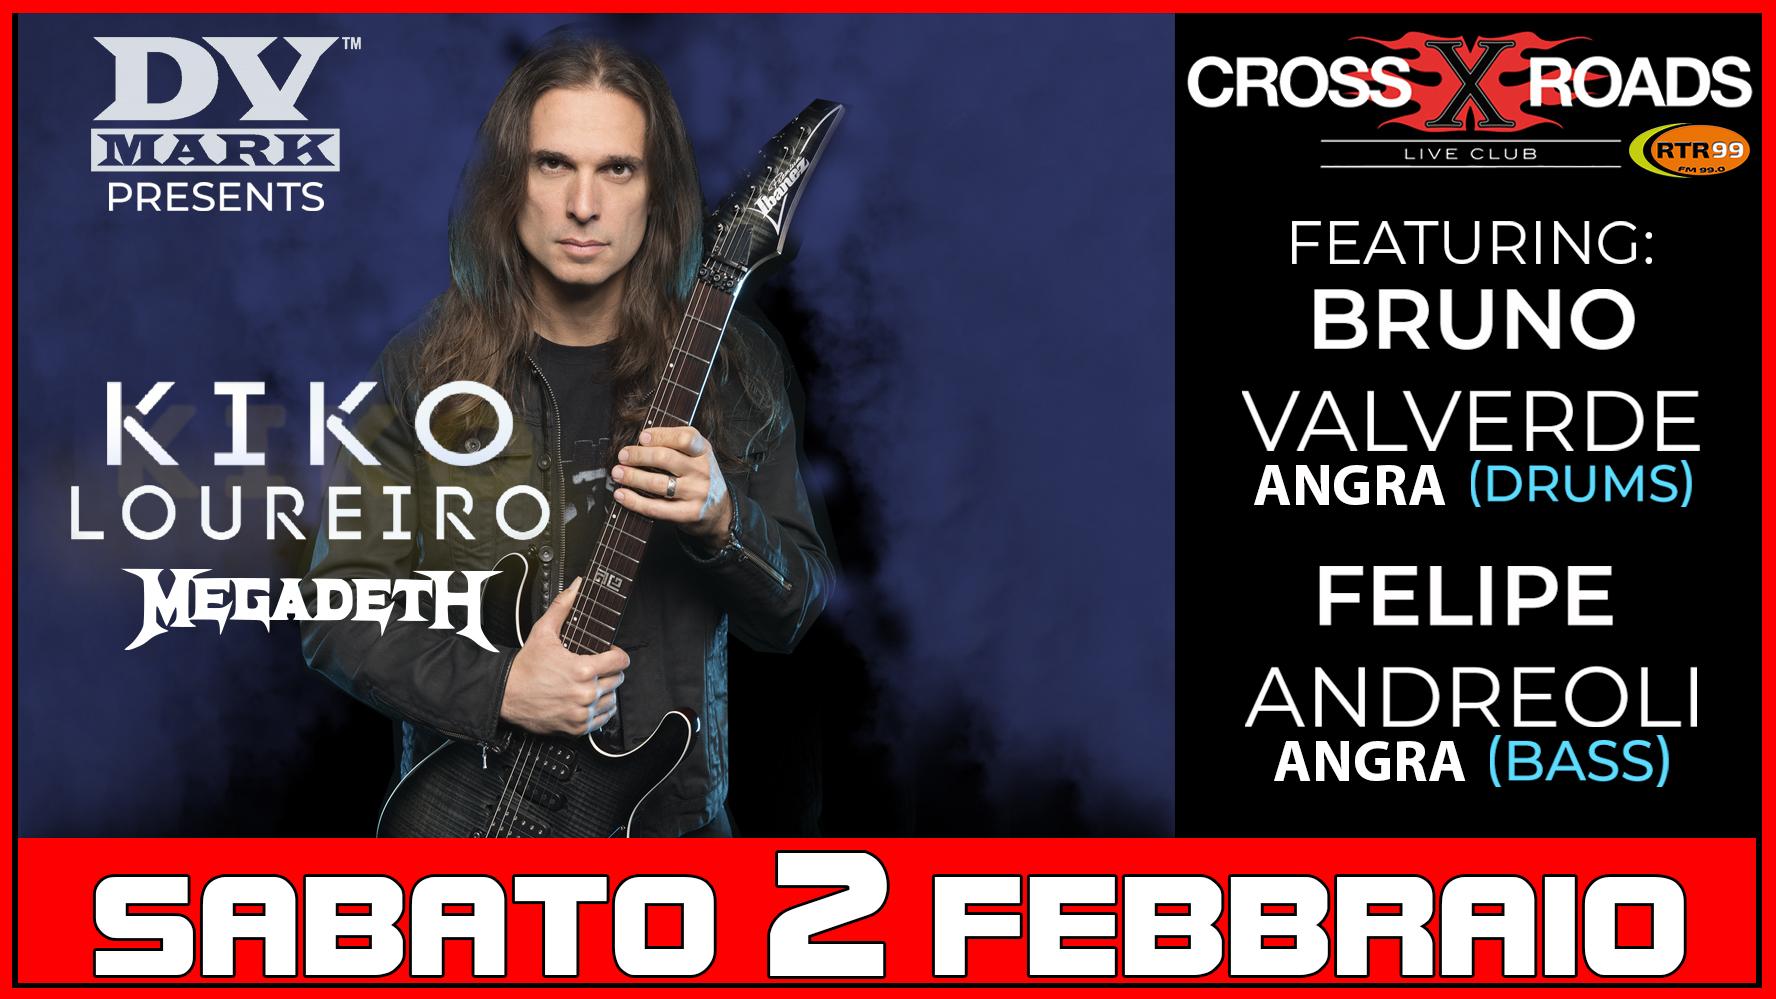 Kiko Loureiro - Bruno Valverde - Felipe Andreoli - Crossroads Live Club - Live 2019 - Promo